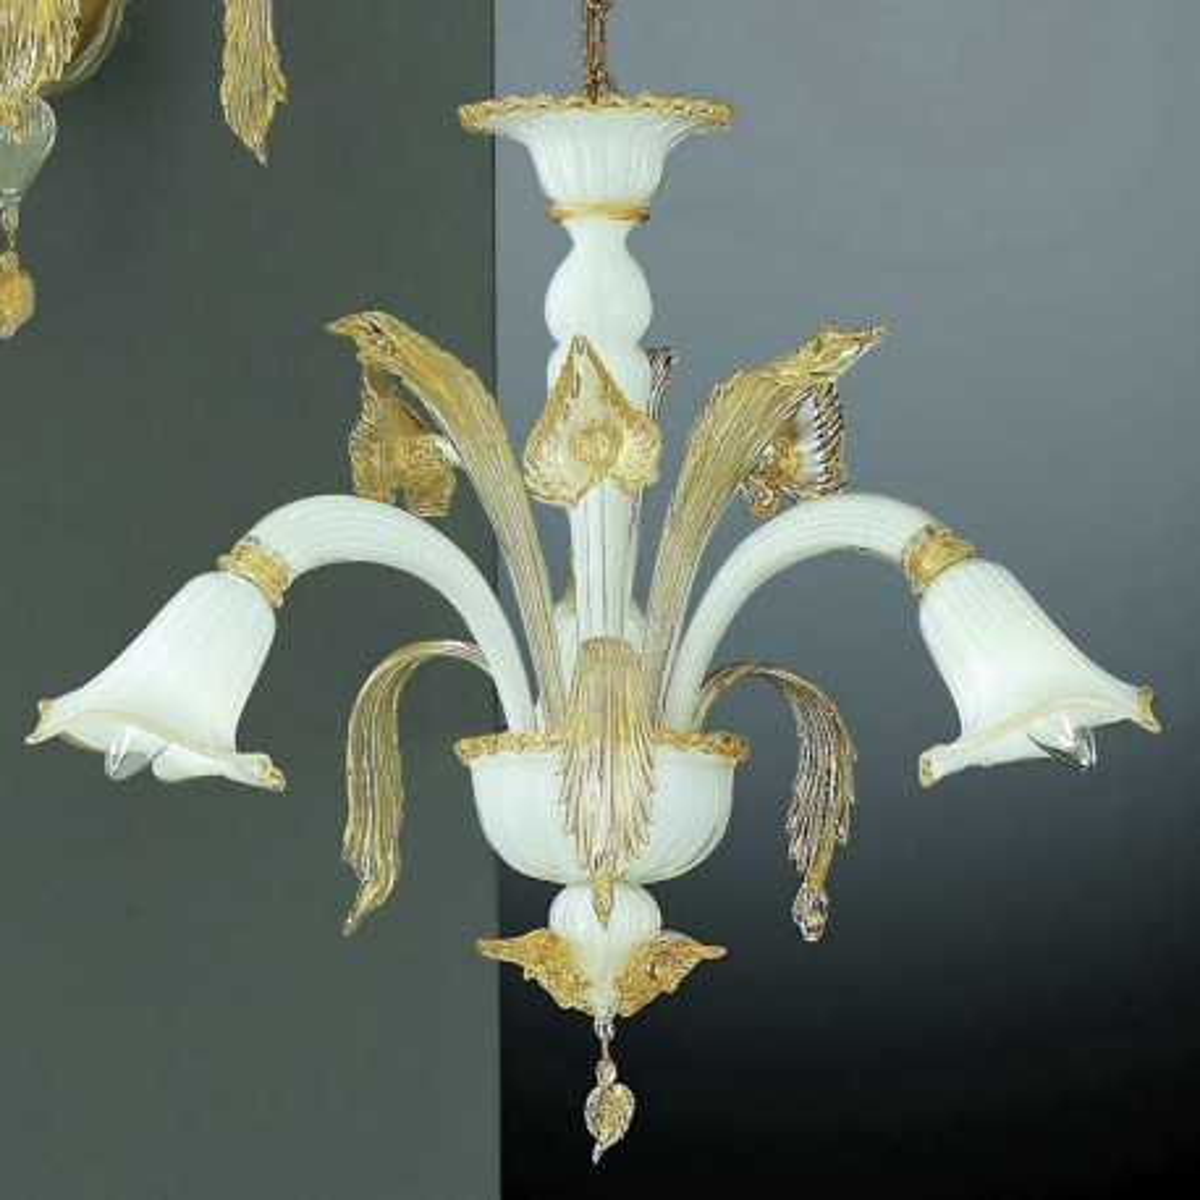 Laguna 3 luces lampara Murano - color blanco y oro